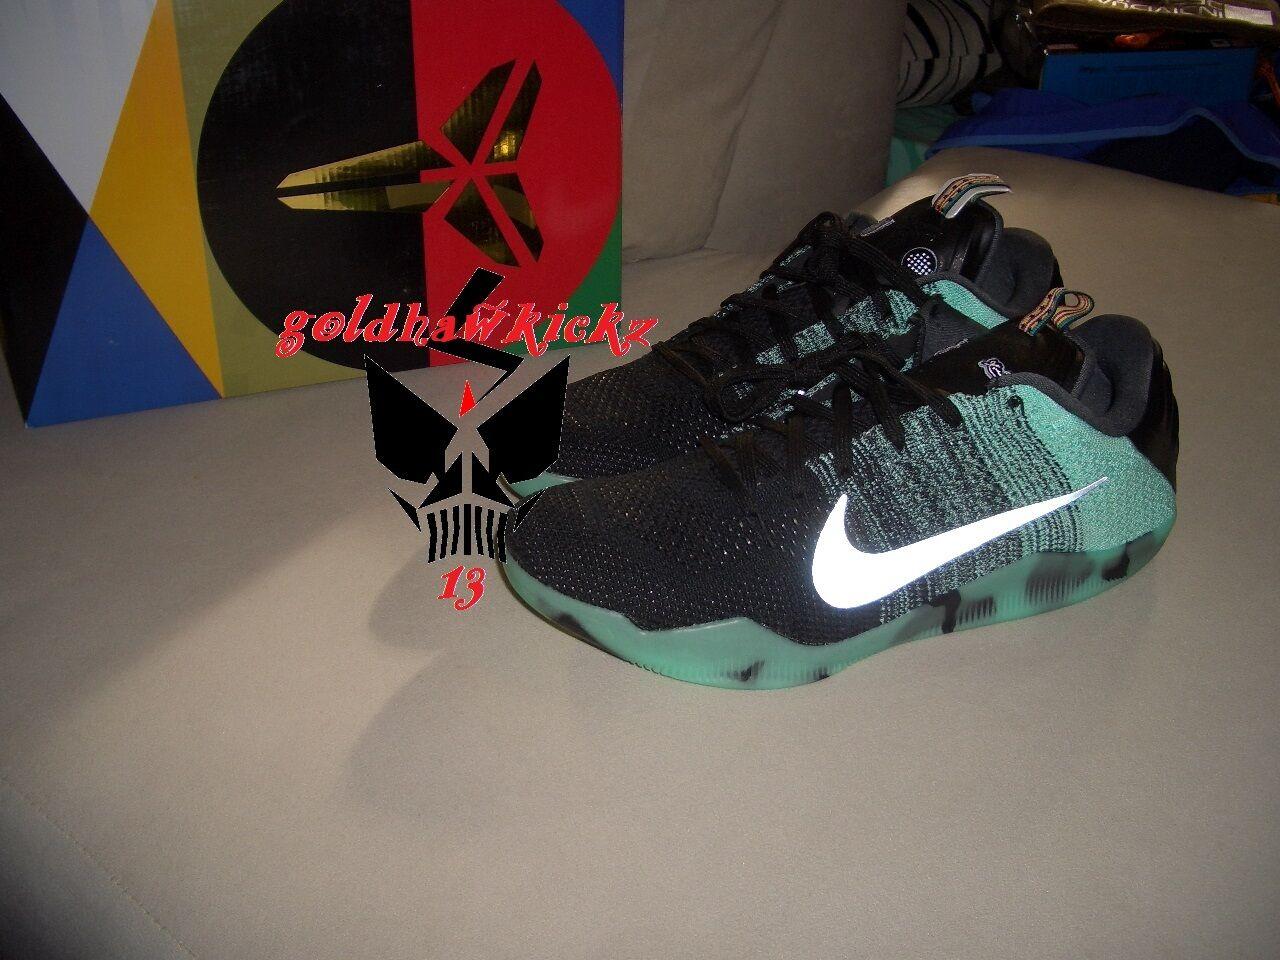 Nike kobe xi 11 elite bassa come all star game bagliore verde 822521-305 gitd toronto